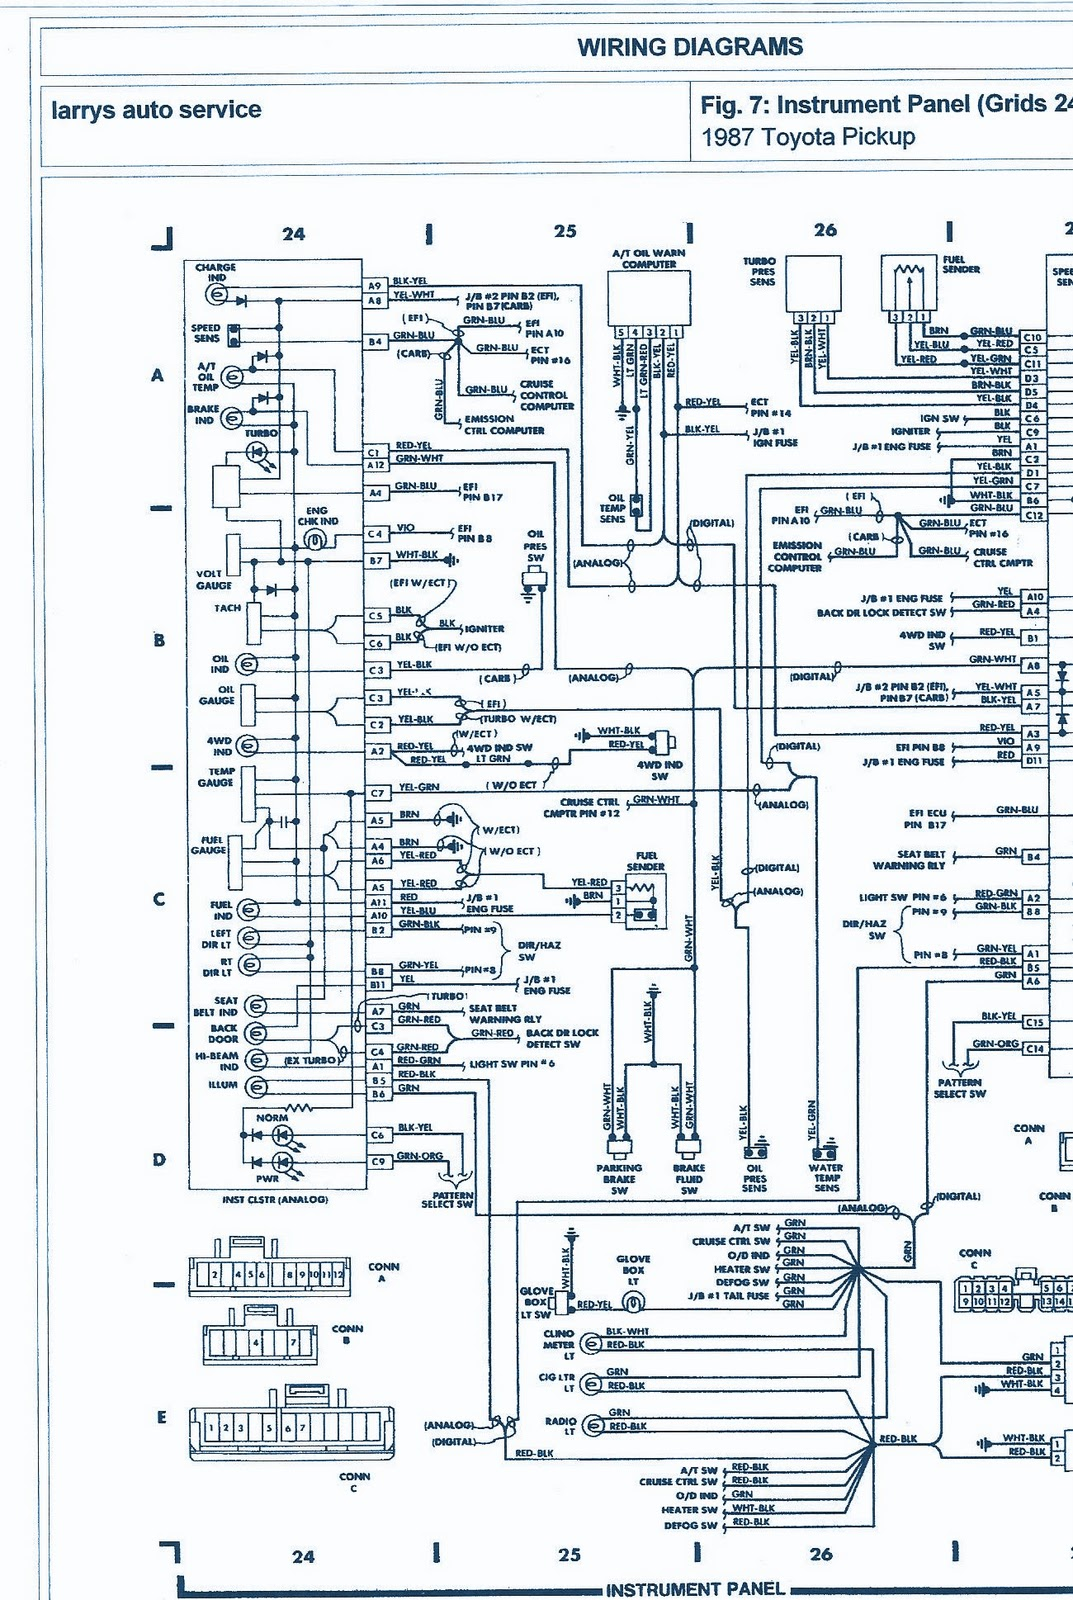 22r Distributor Wiring Diagram Dolgular Com